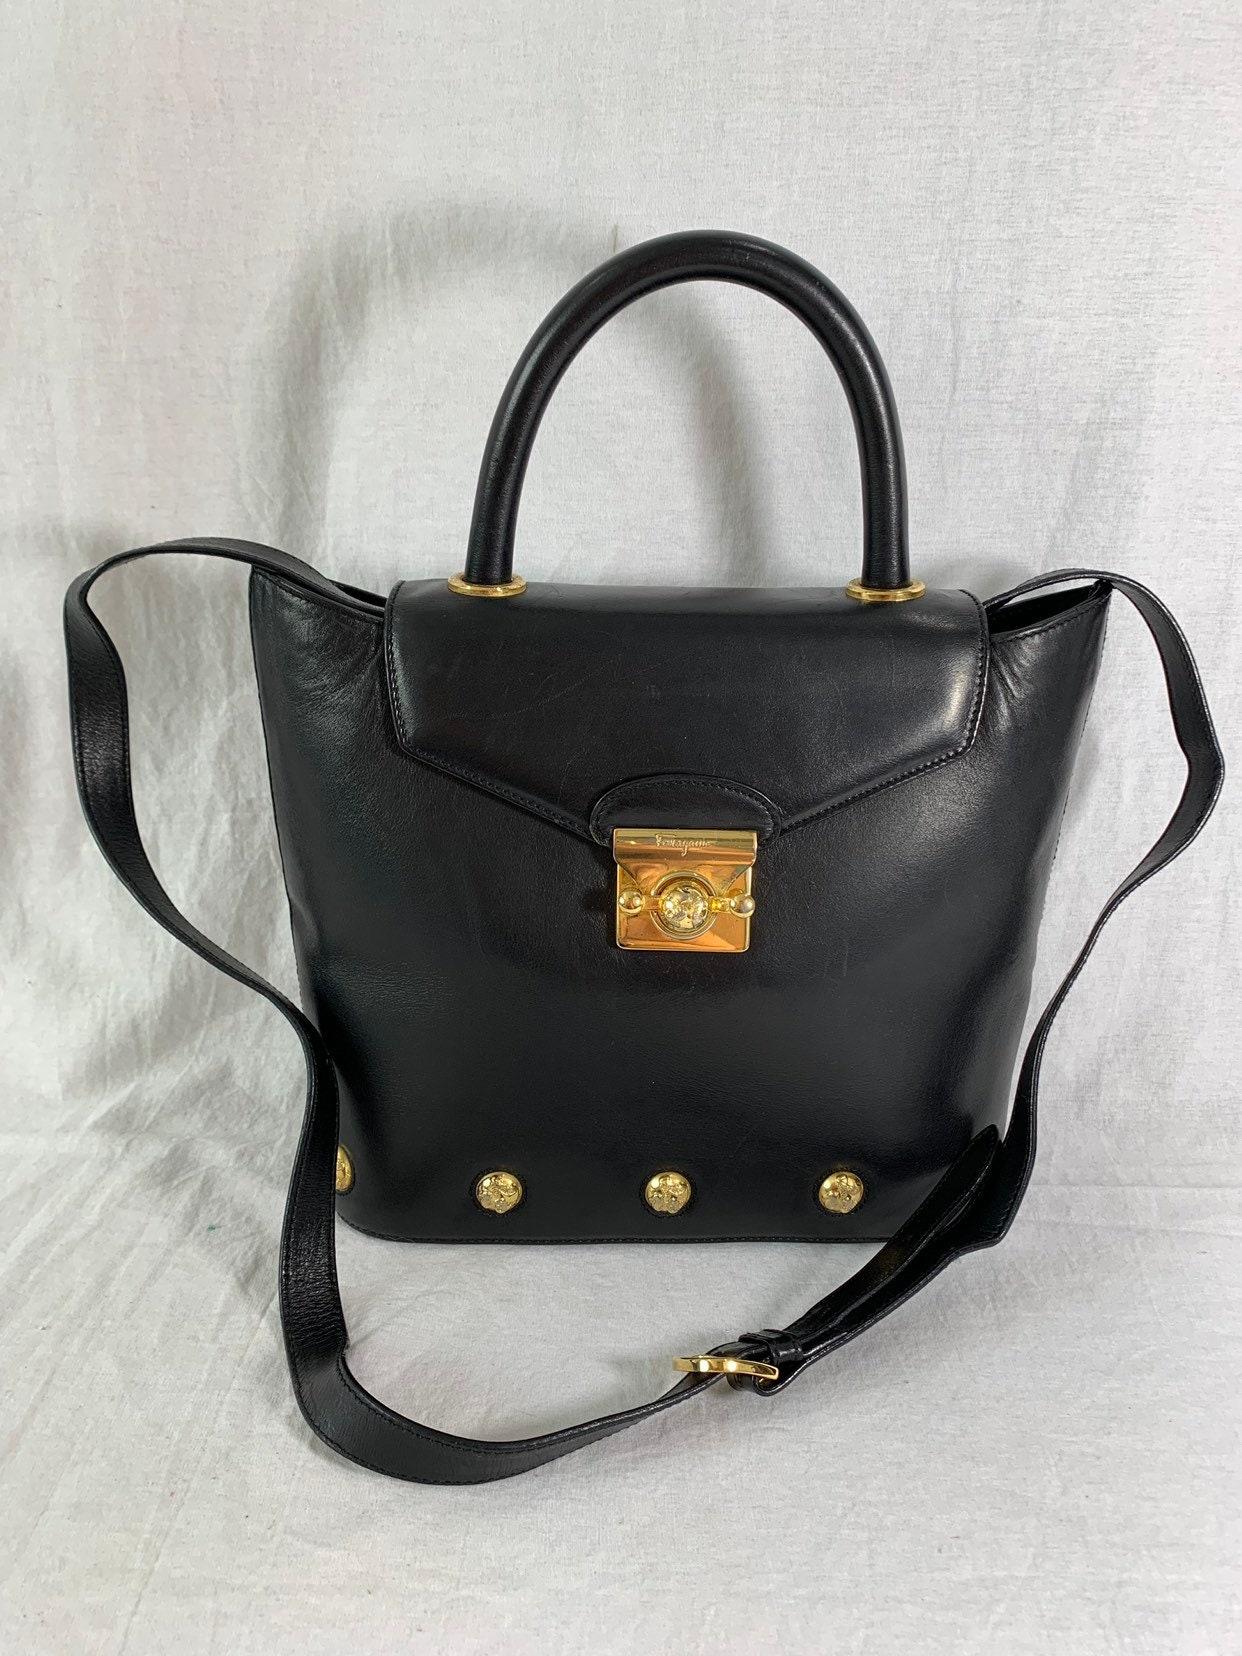 SALVATORE FERRAGAMO Vintage Authentic Black Leather Shoulder Bag Made in  Italy f2119183df7ee